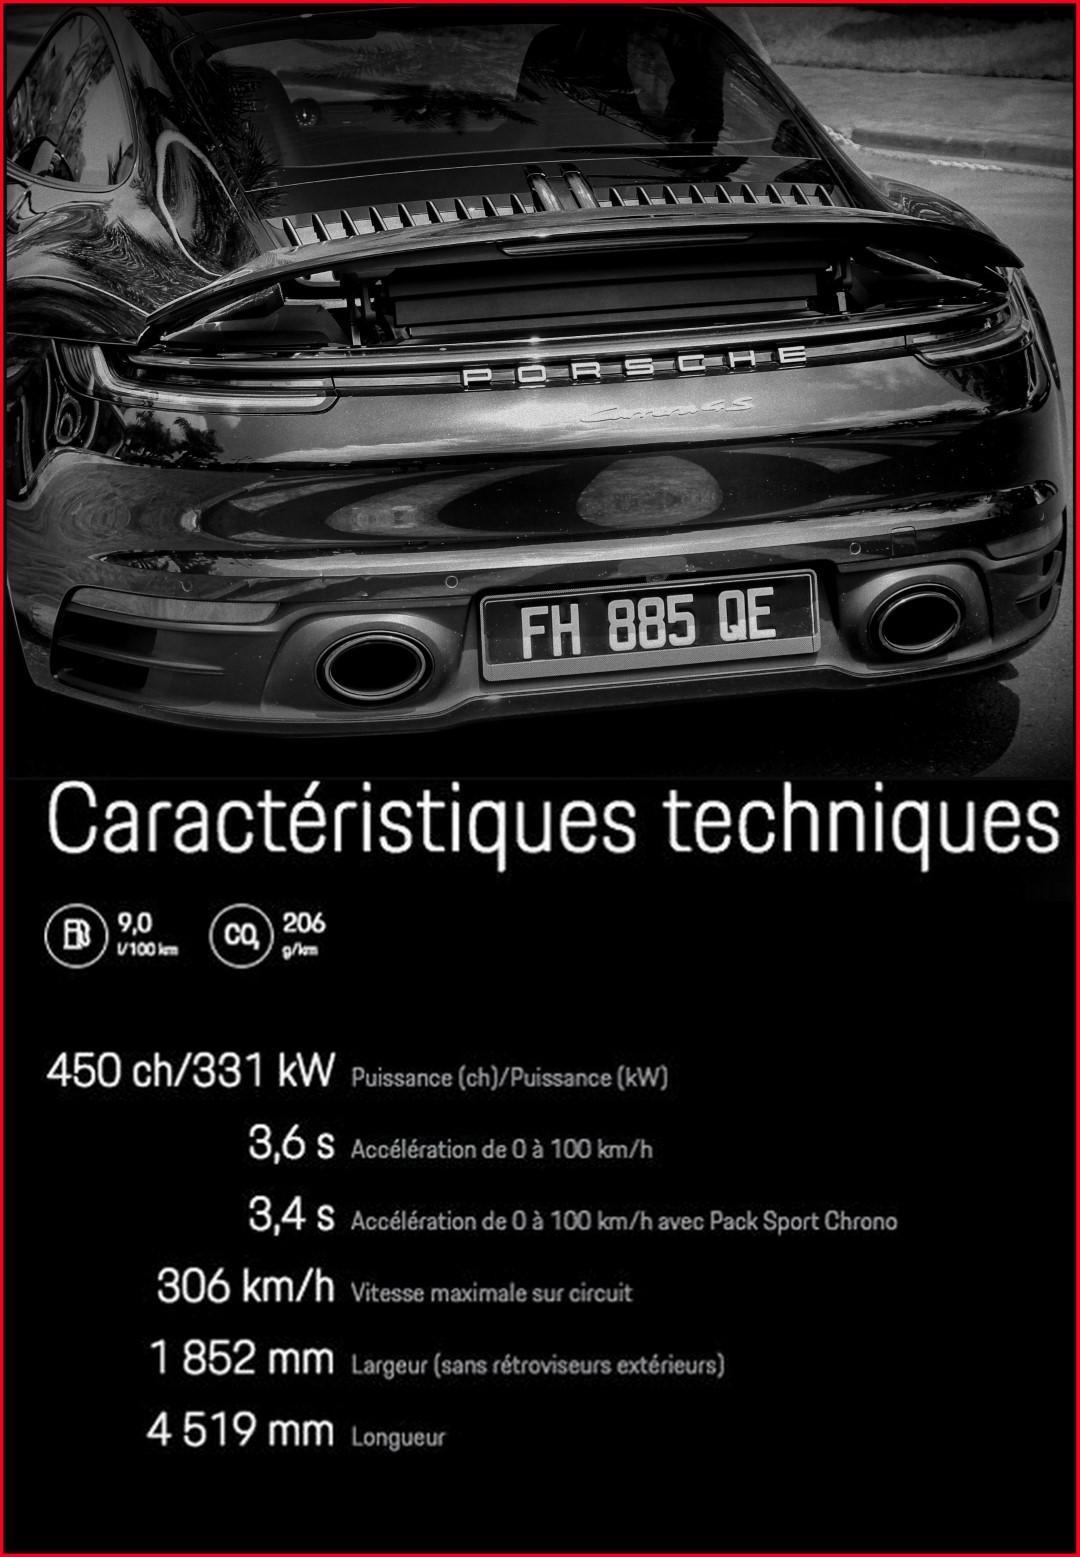 la-technologie-au-service-du-pilote-porsche-911-carrera-4s-type-992-1115-6.jpg